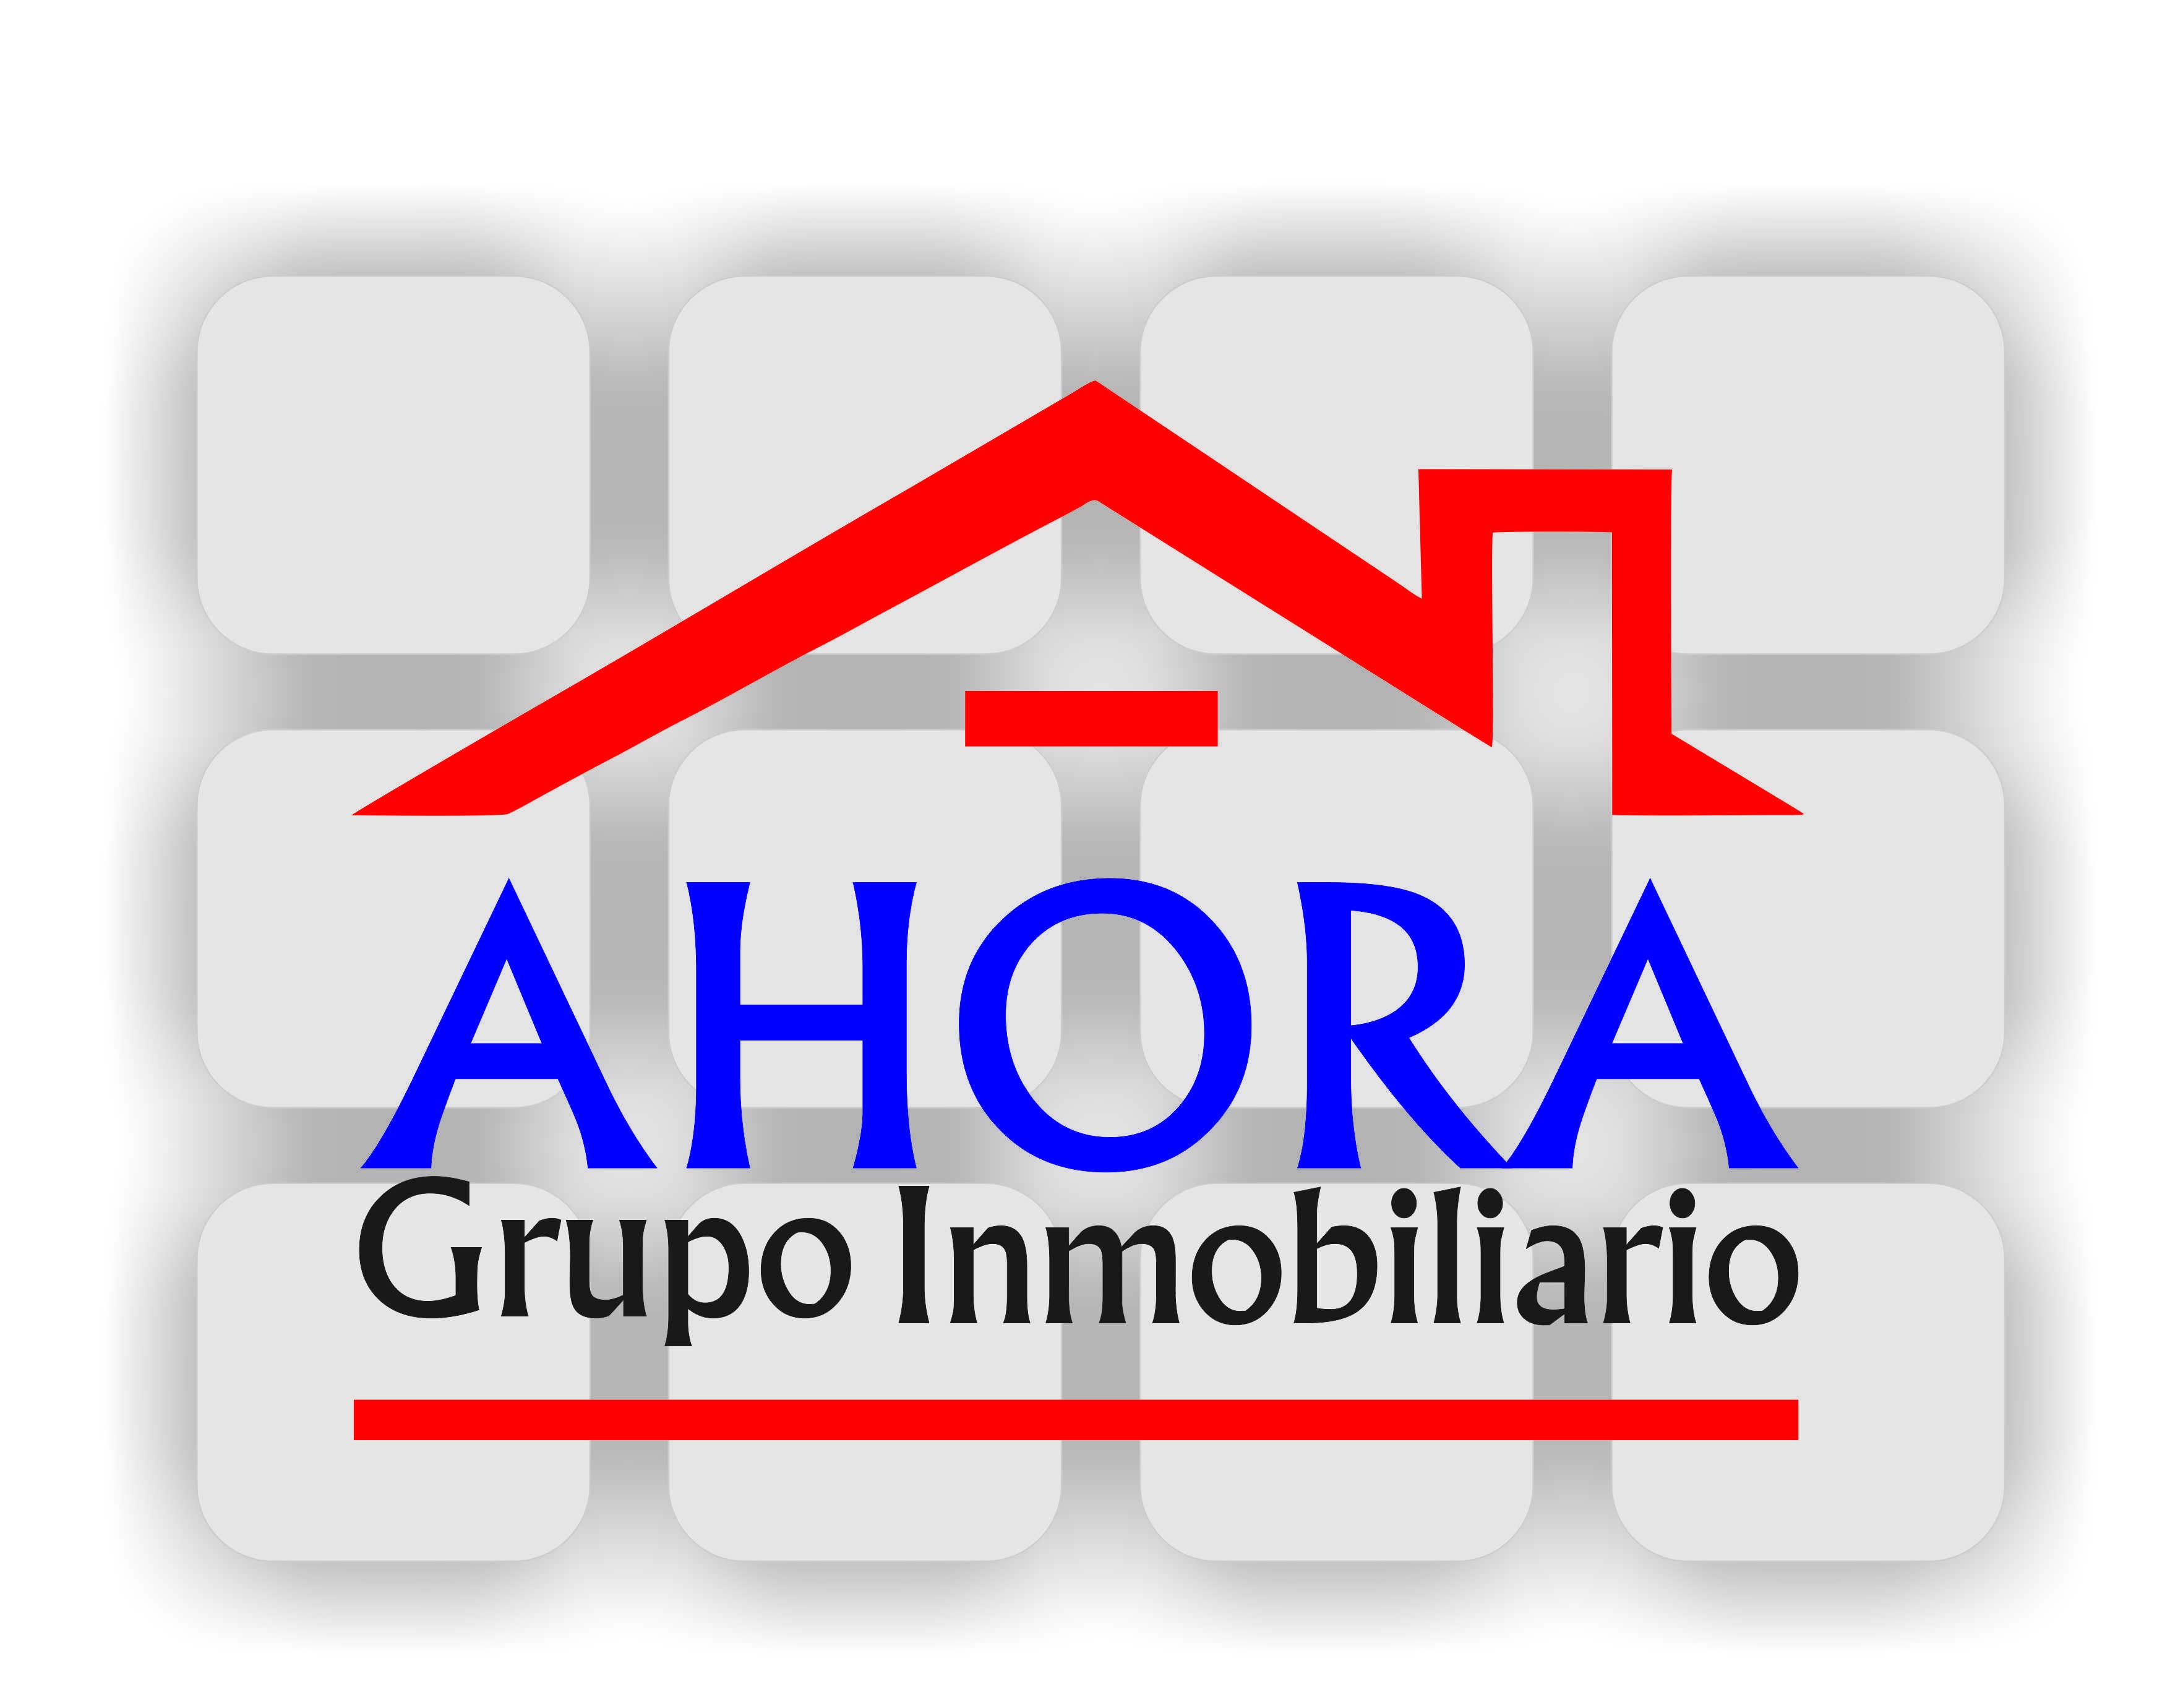 AHORA Grupo Inmobiliario